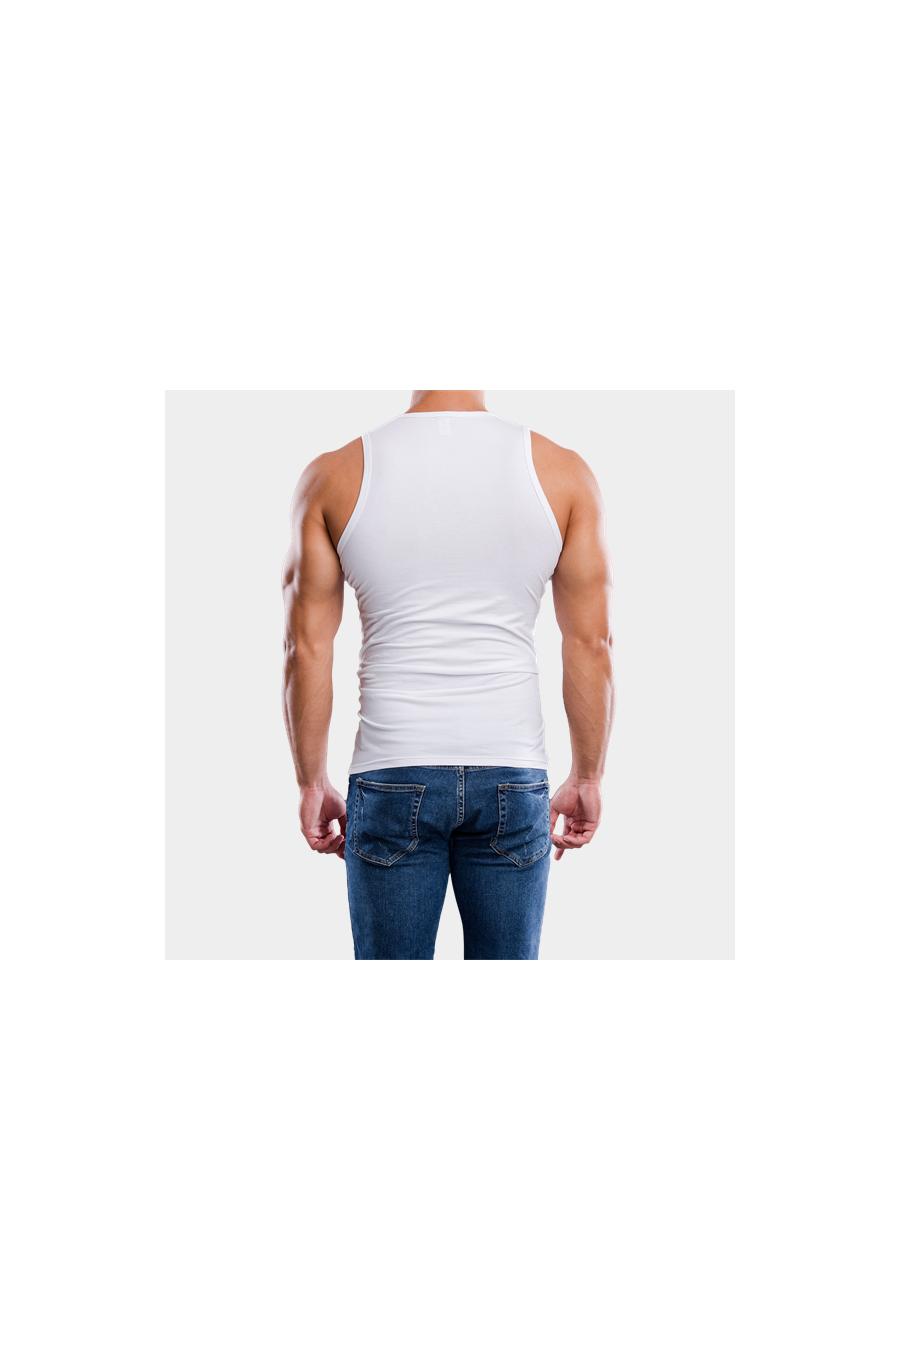 Trikók, pólók - J.PRESS - Férfi ujjatlan alsópóló J.PRESS